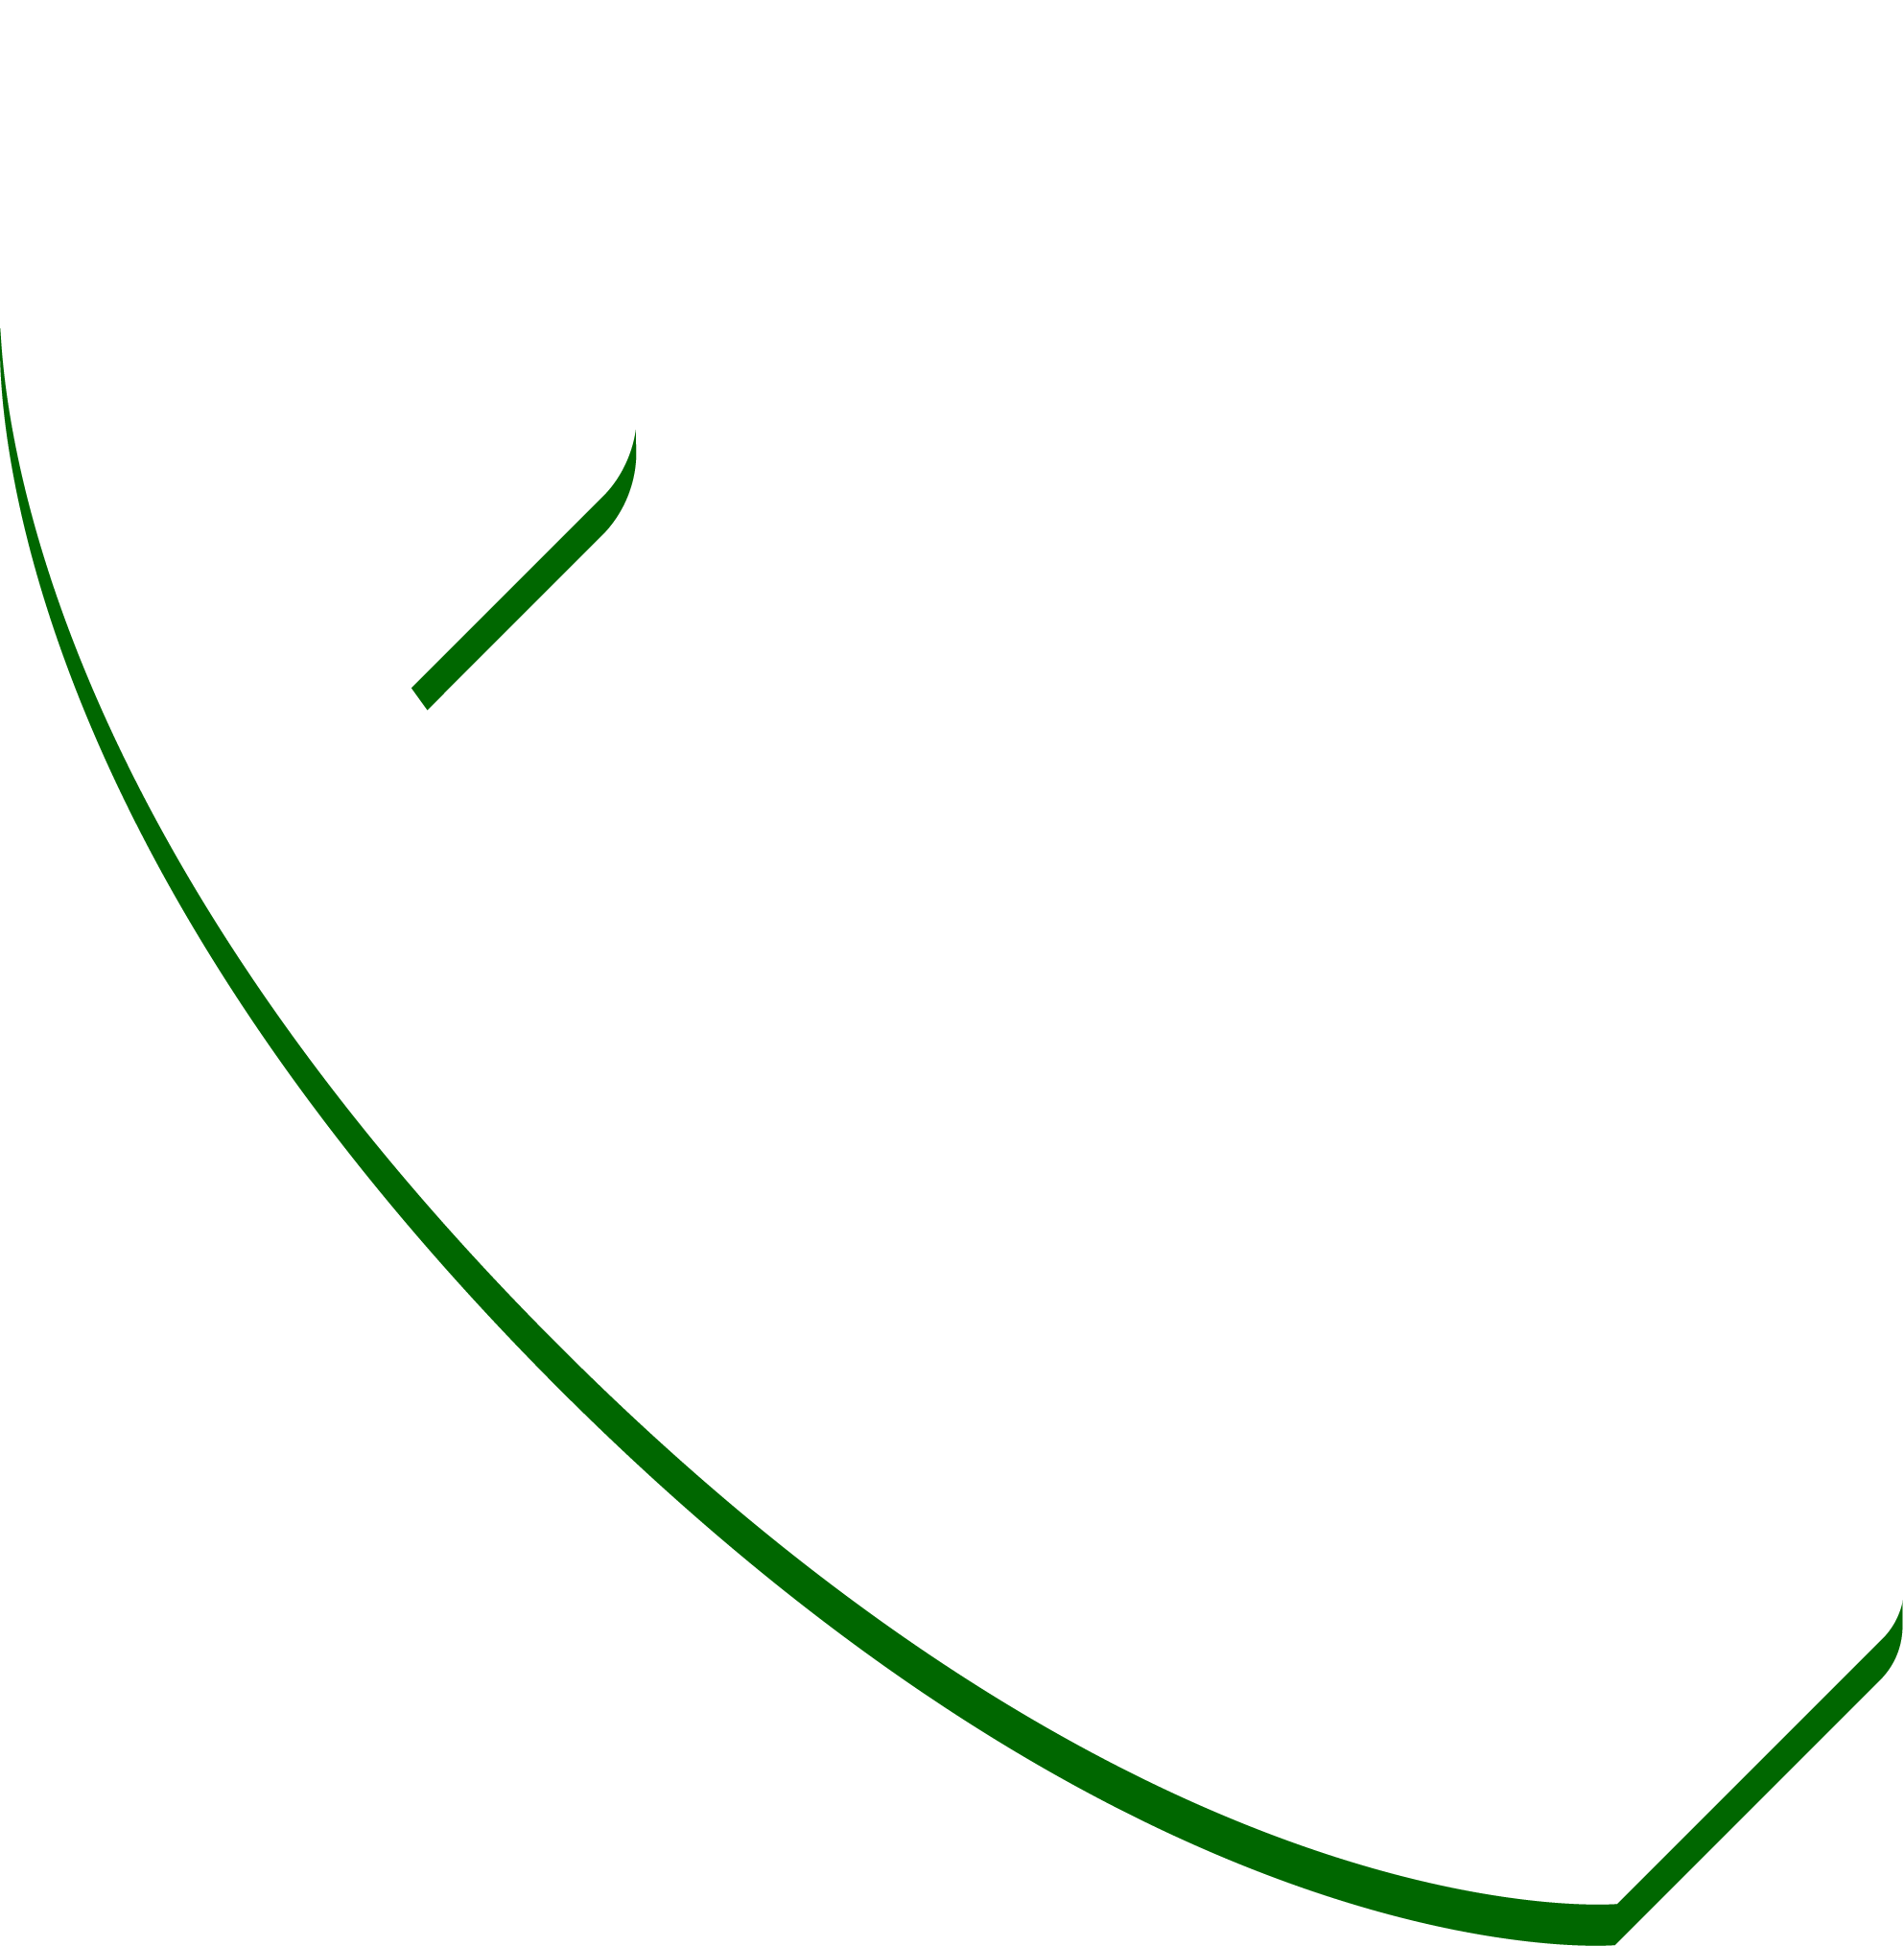 Hotline 02439913130